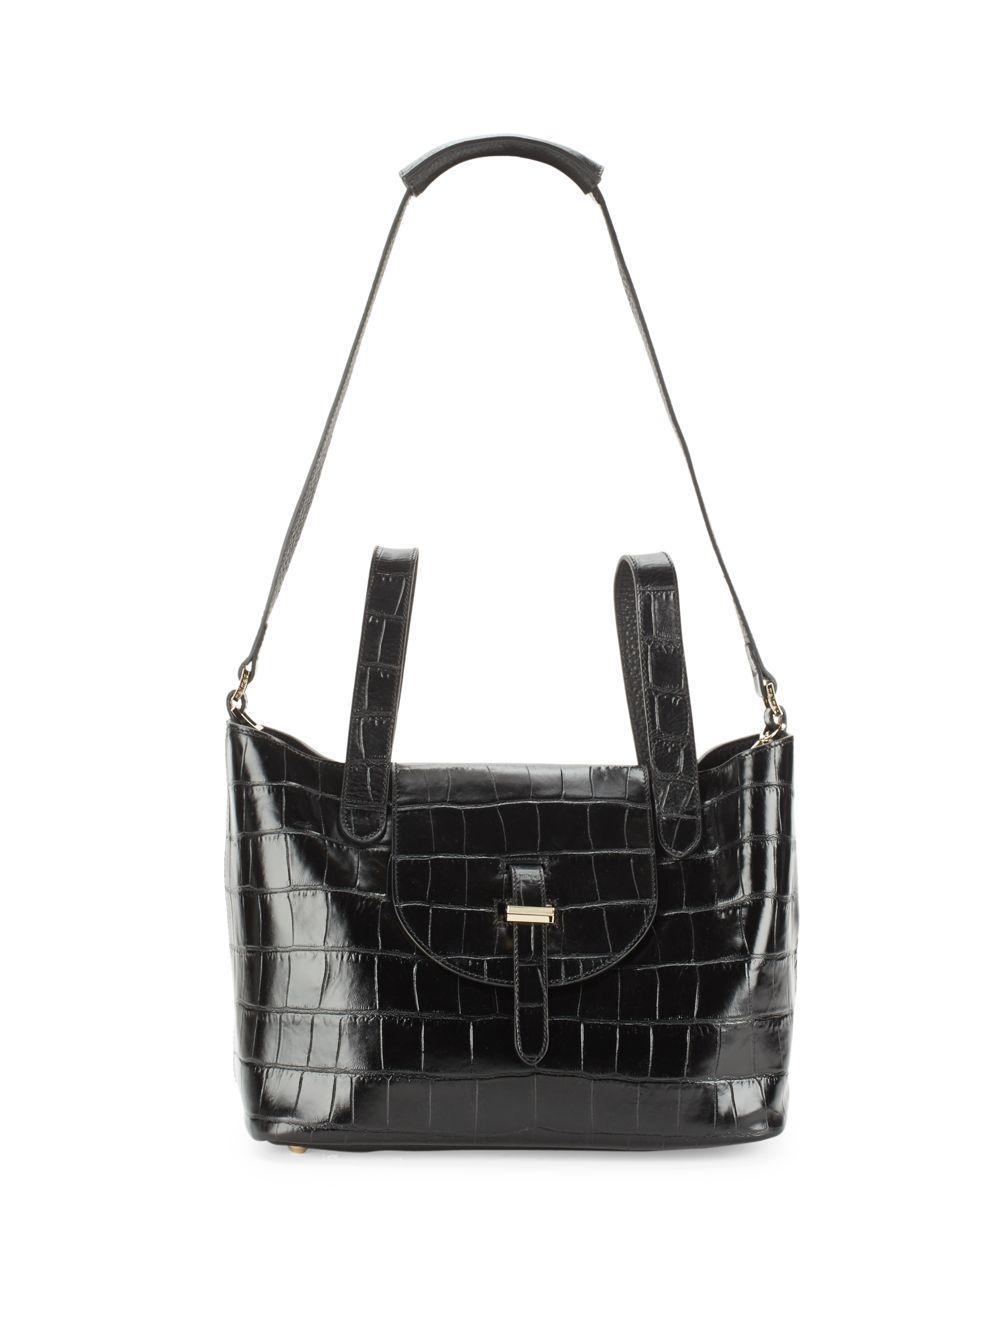 e292ed988e Meli Melo Textured Italian Leather Handbag in Black - Lyst